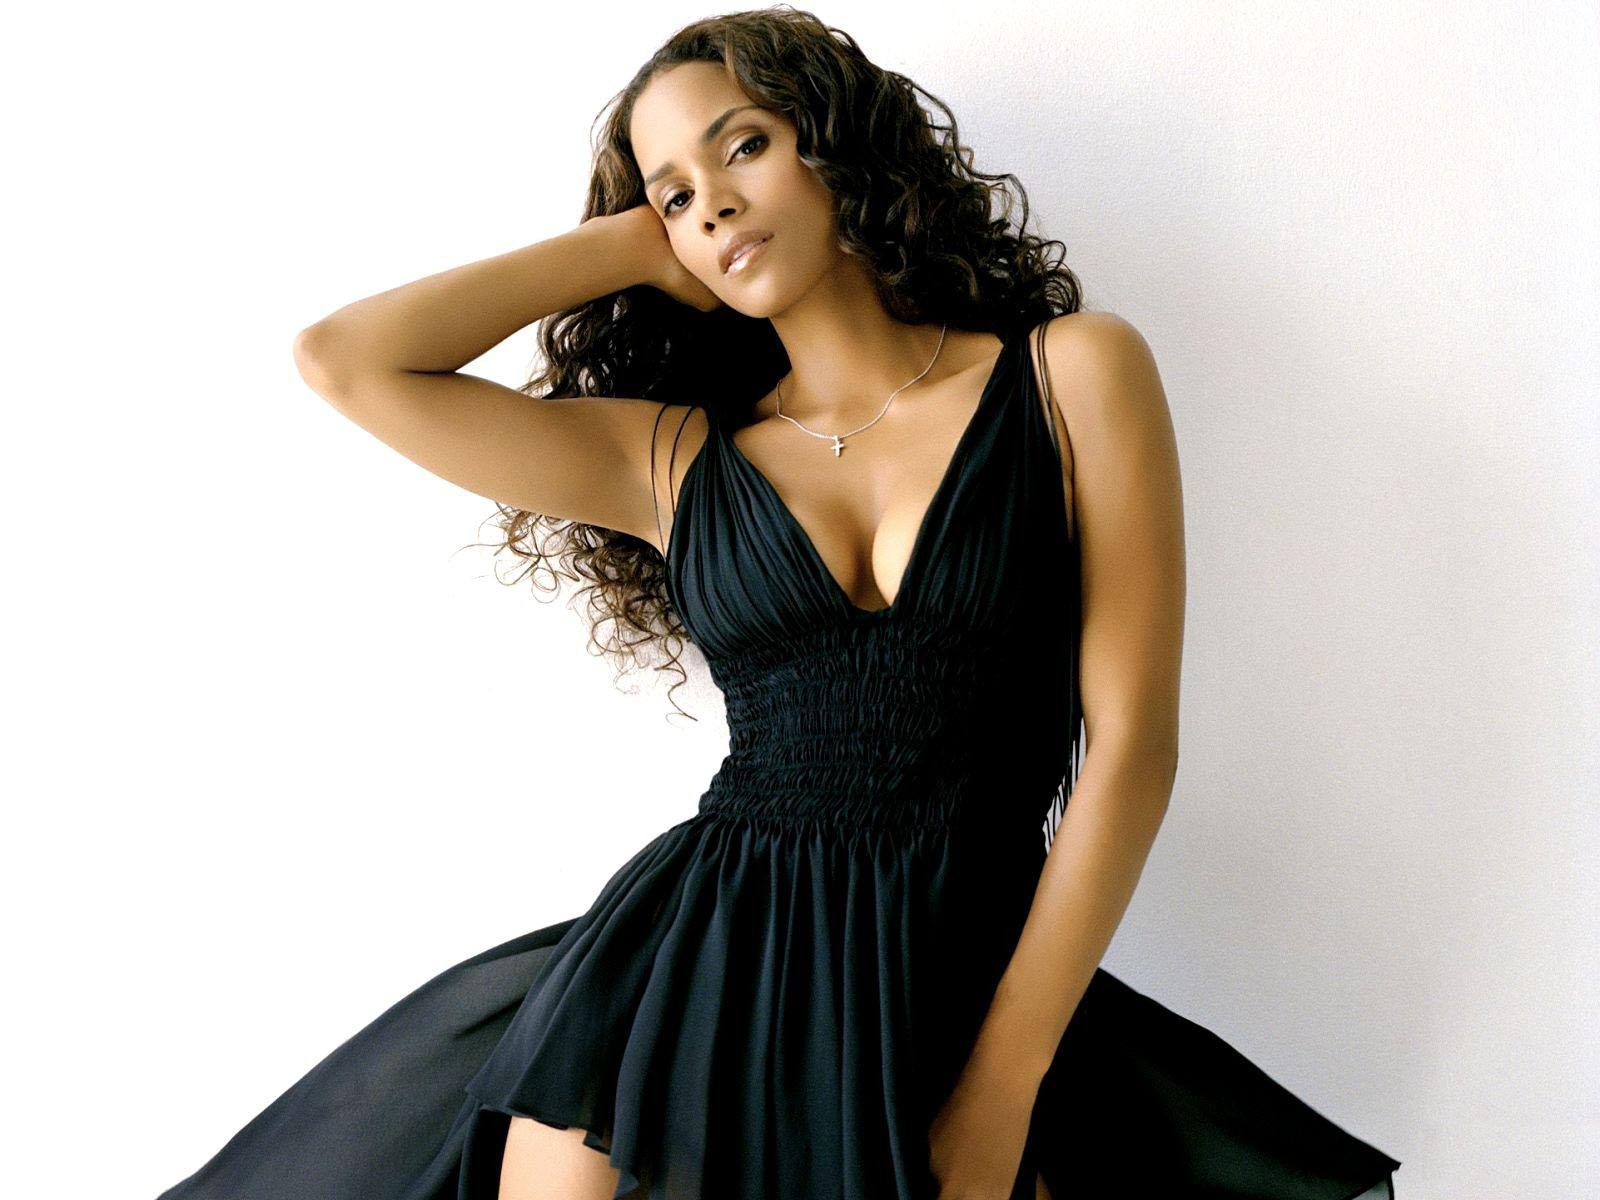 http://3.bp.blogspot.com/-wV0mwMA3HmE/TZoh2I1yDpI/AAAAAAAAADg/kZp0P8Y6RVs/s1600/1249433920_1600x1200_halle-berry-in-black-dress.jpg